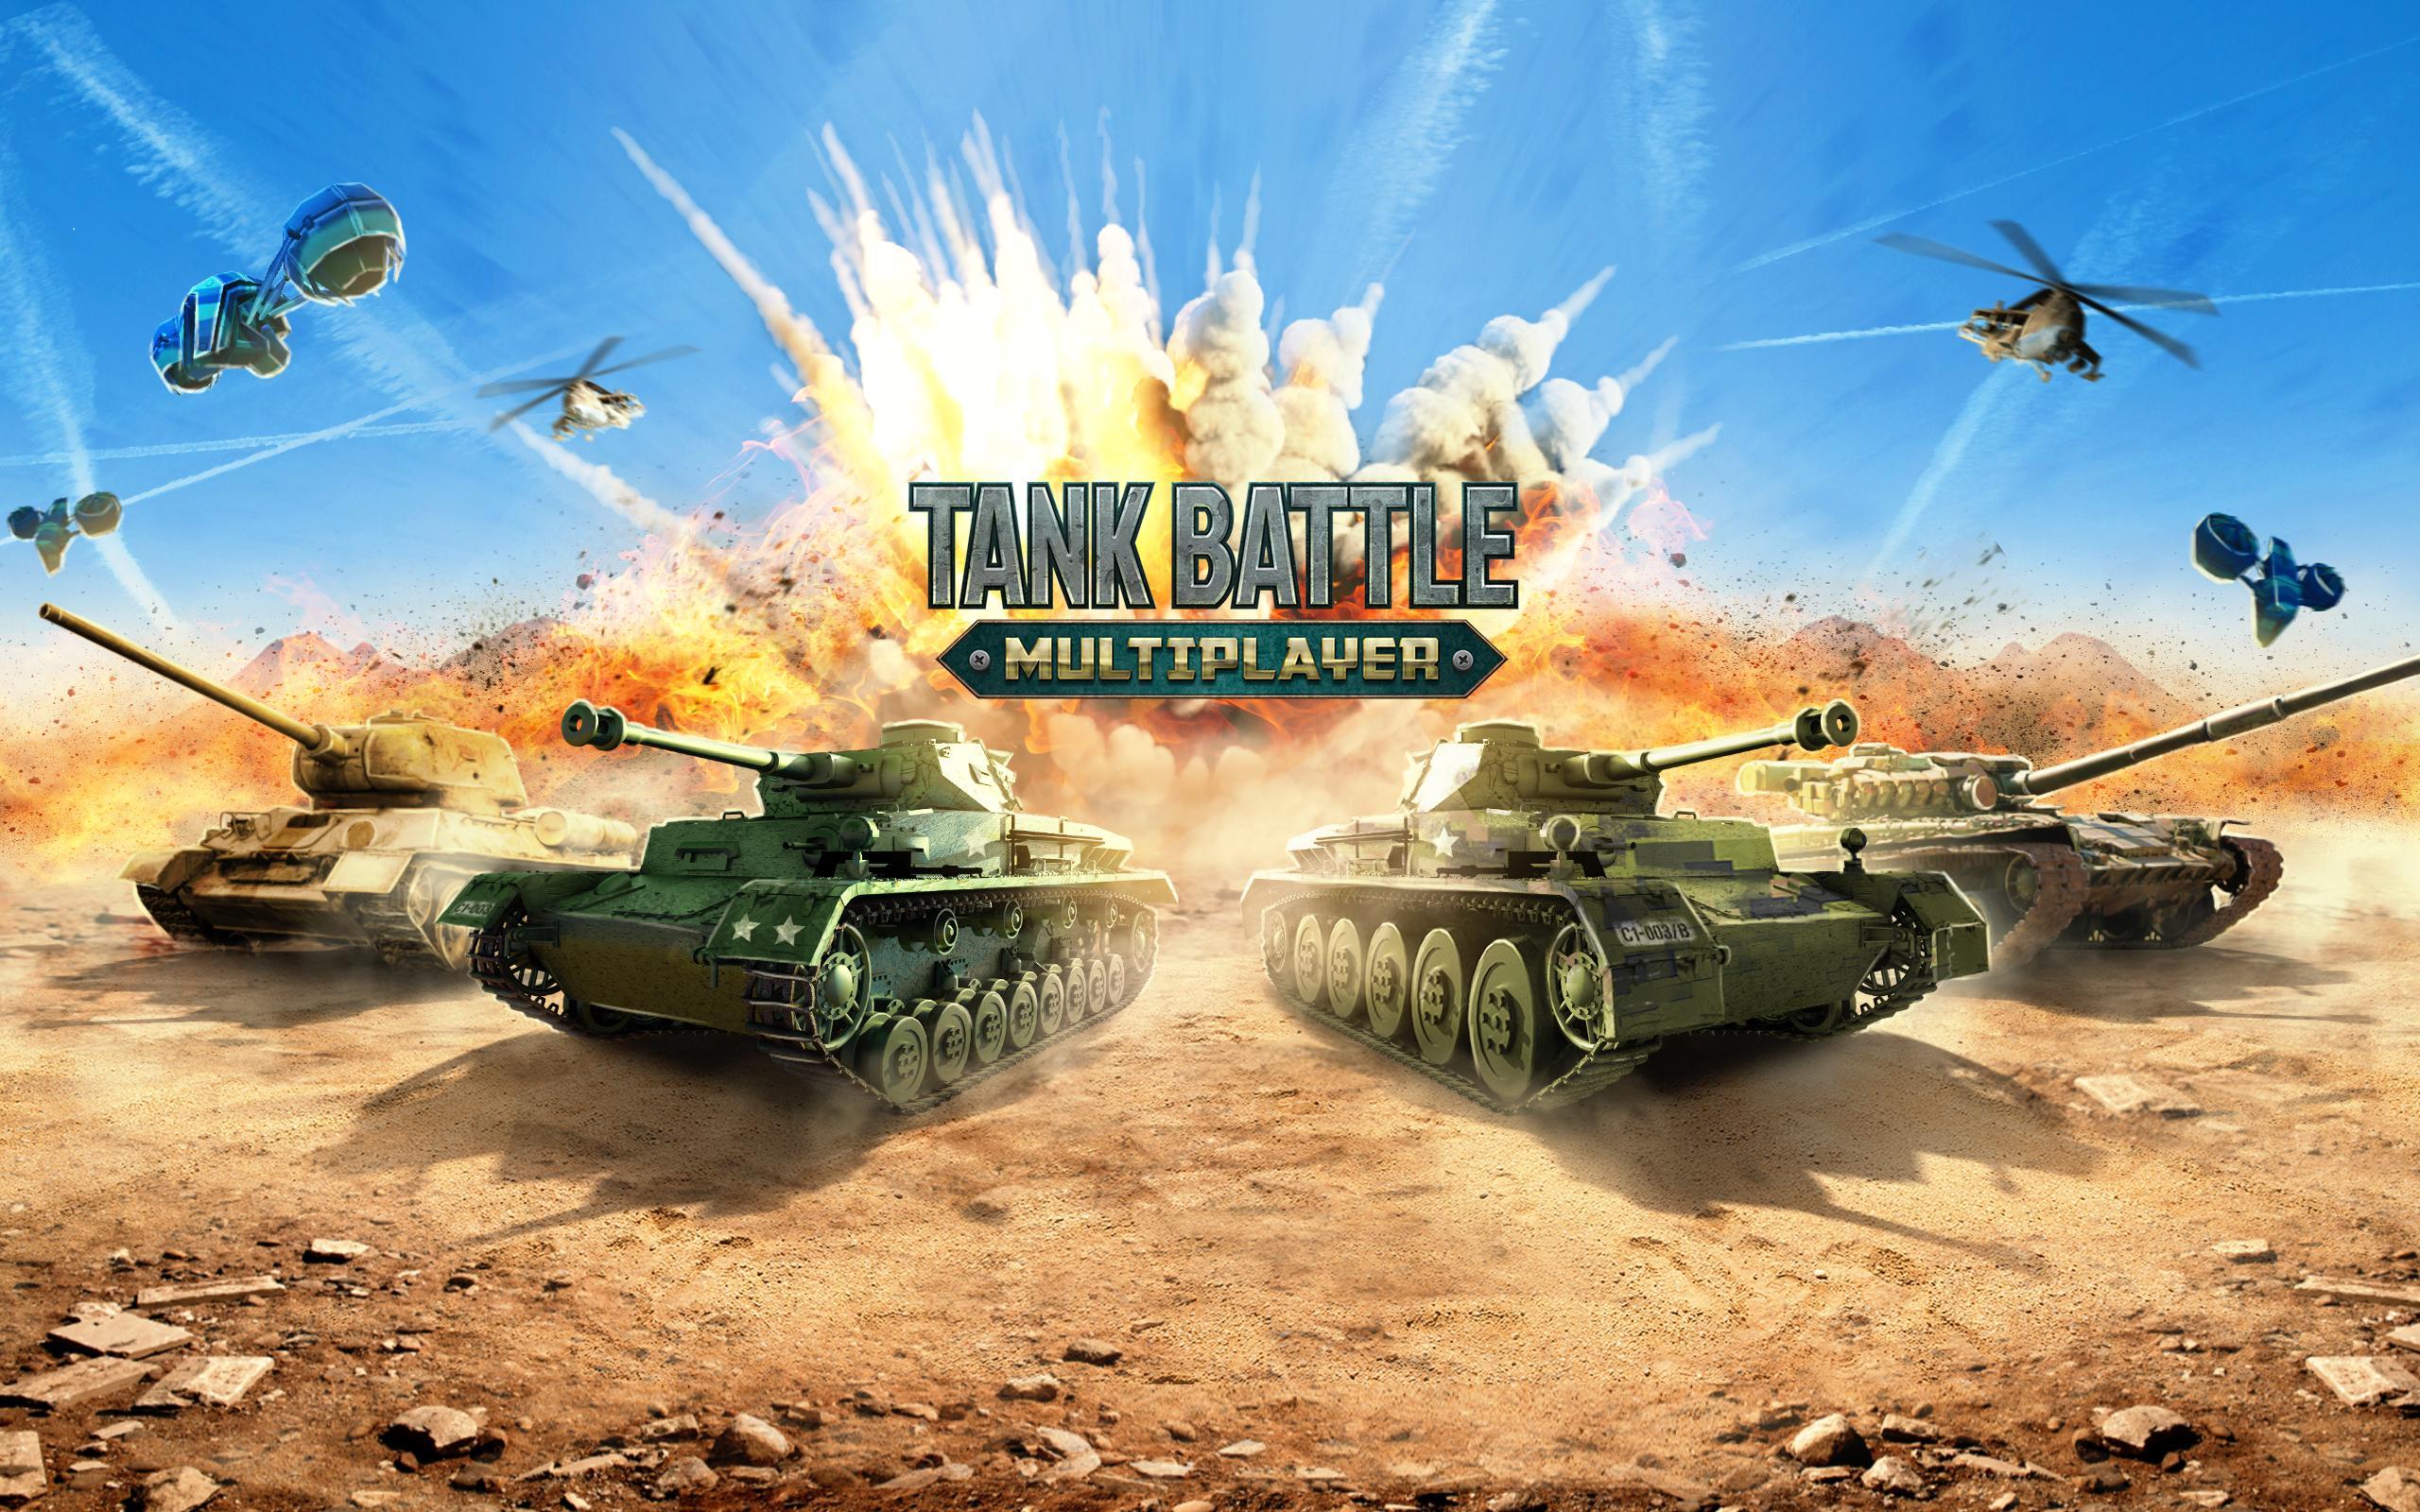 Tank Battle cho Android - Tải về APK